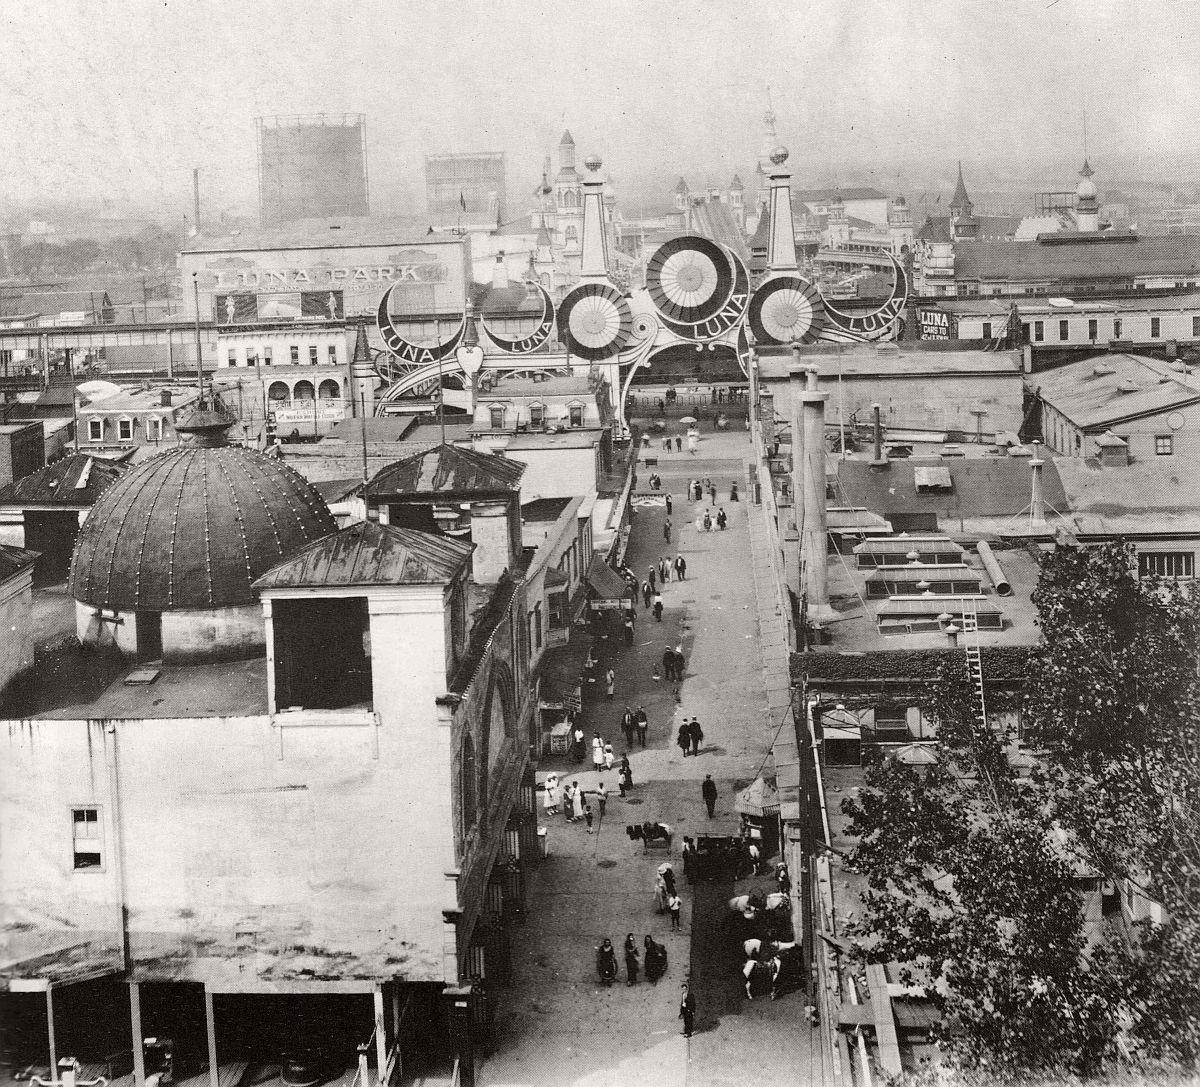 vintage-historic-new-york-city-black-white-in-1925-41